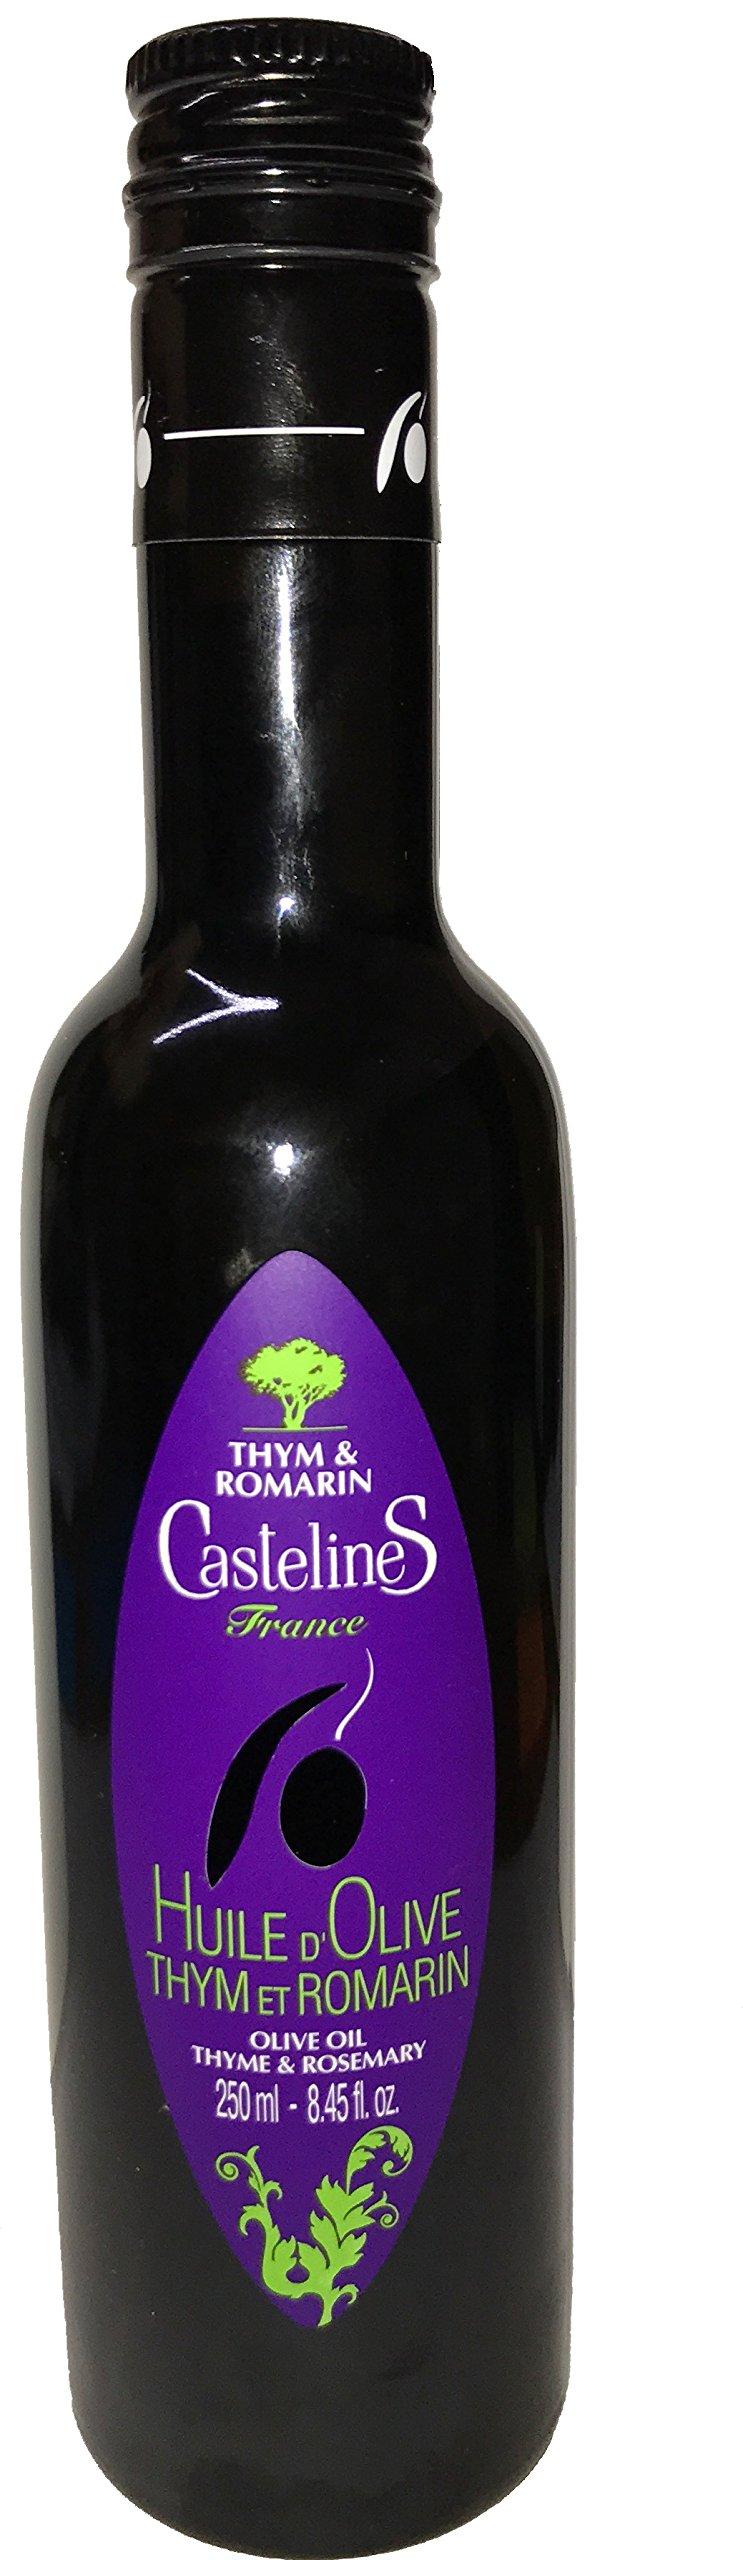 Moulin CastelaS Castelines Thyme & Rosemary Olive Oil 8.45 fl oz.